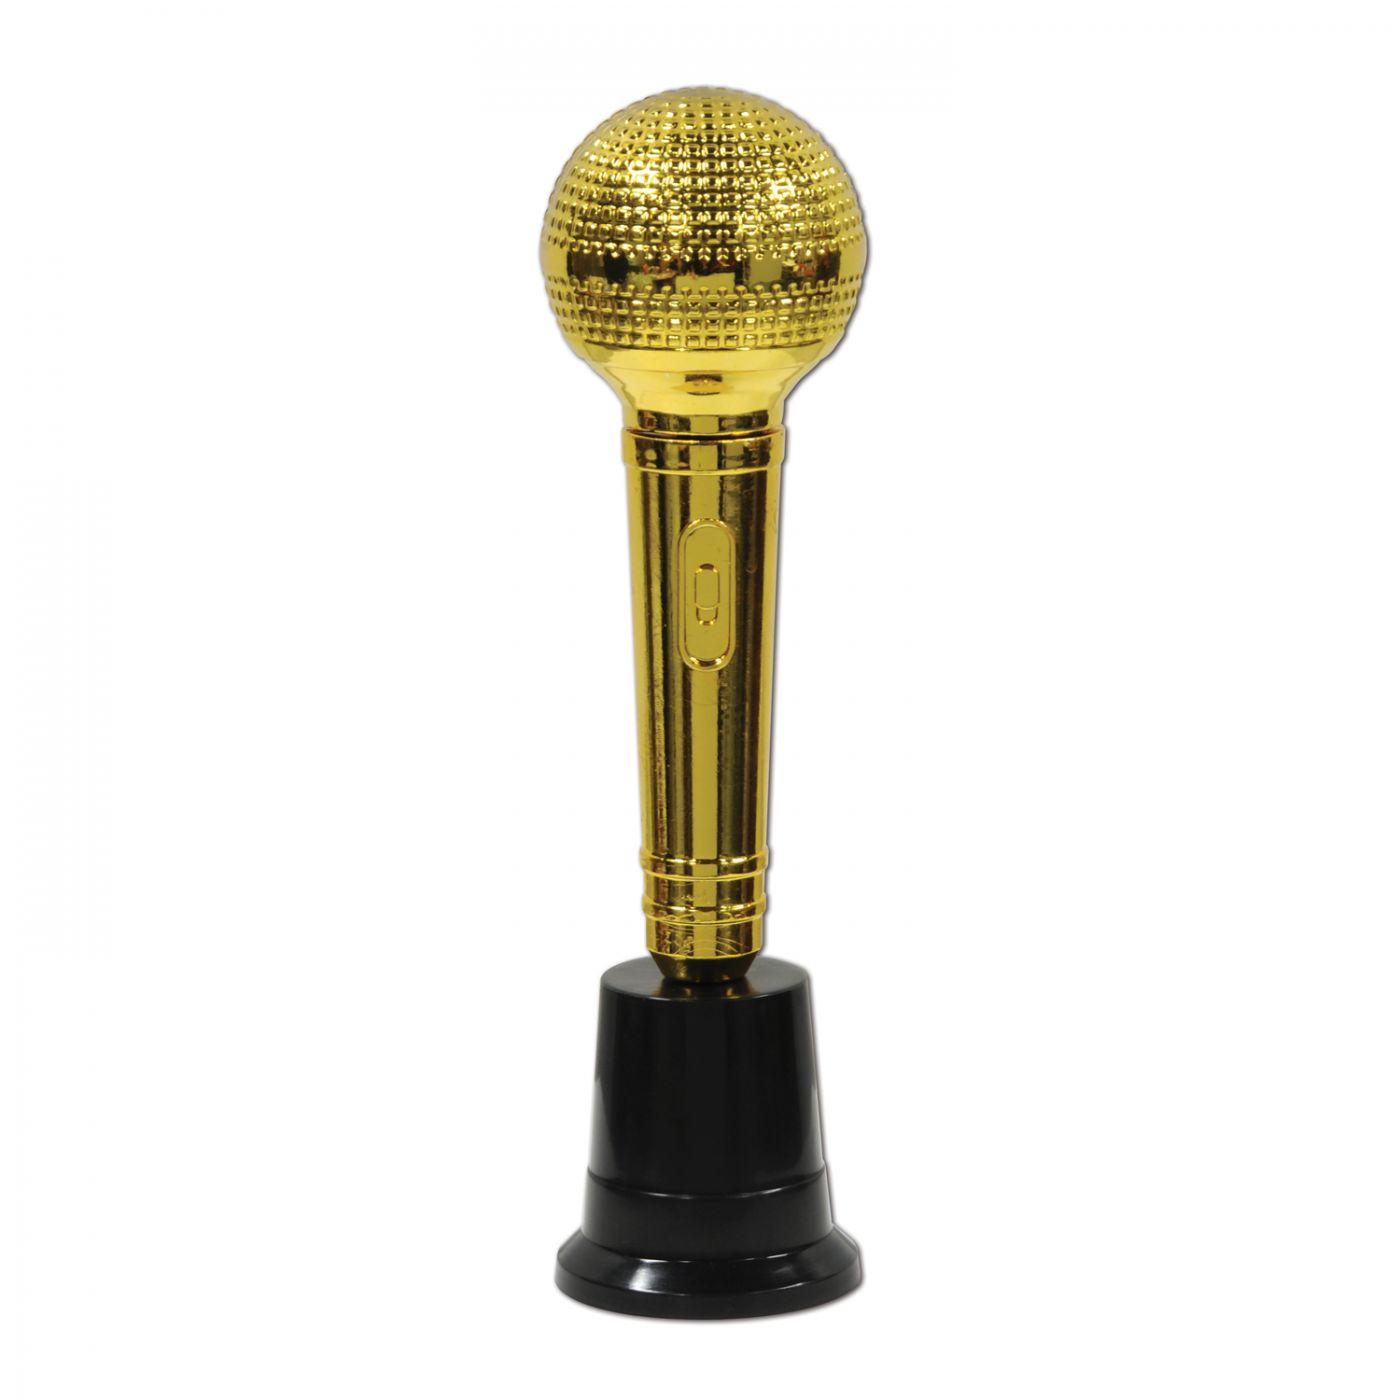 Microphone Award (6) image